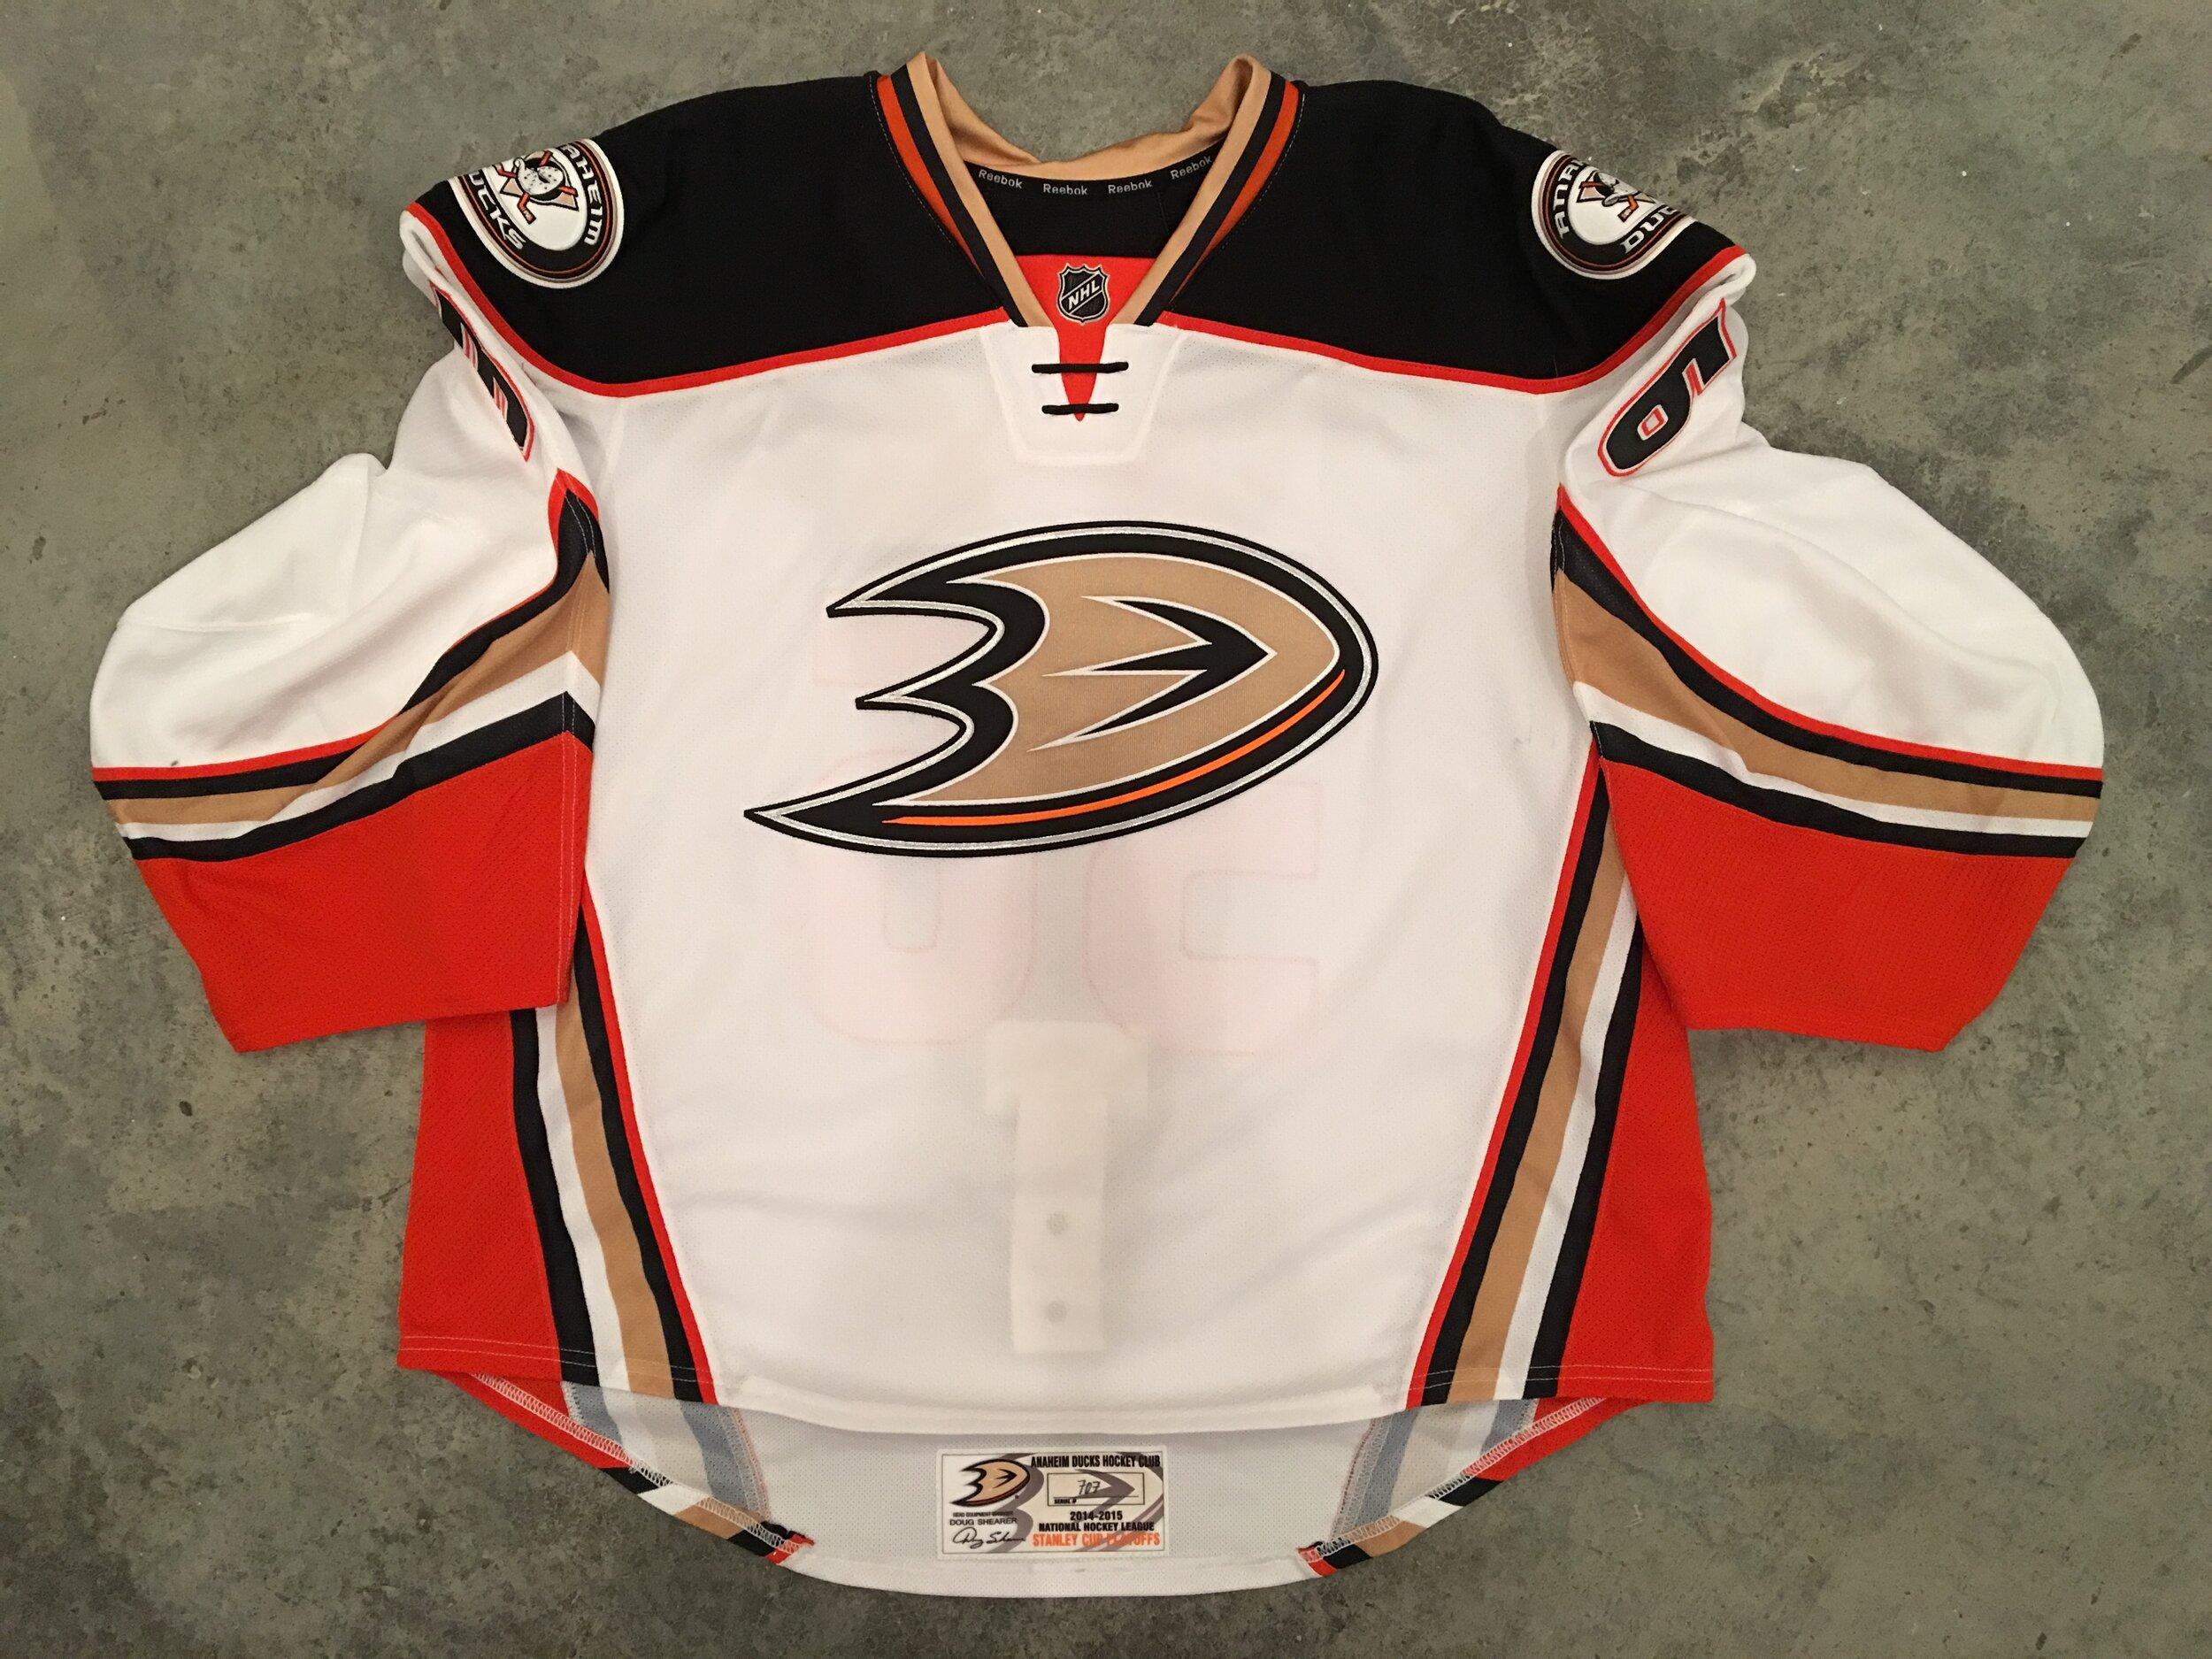 2014-15 John Gibson Anaheim Ducks game worn road jersey - pre-rookie season   For sale or trade - $750